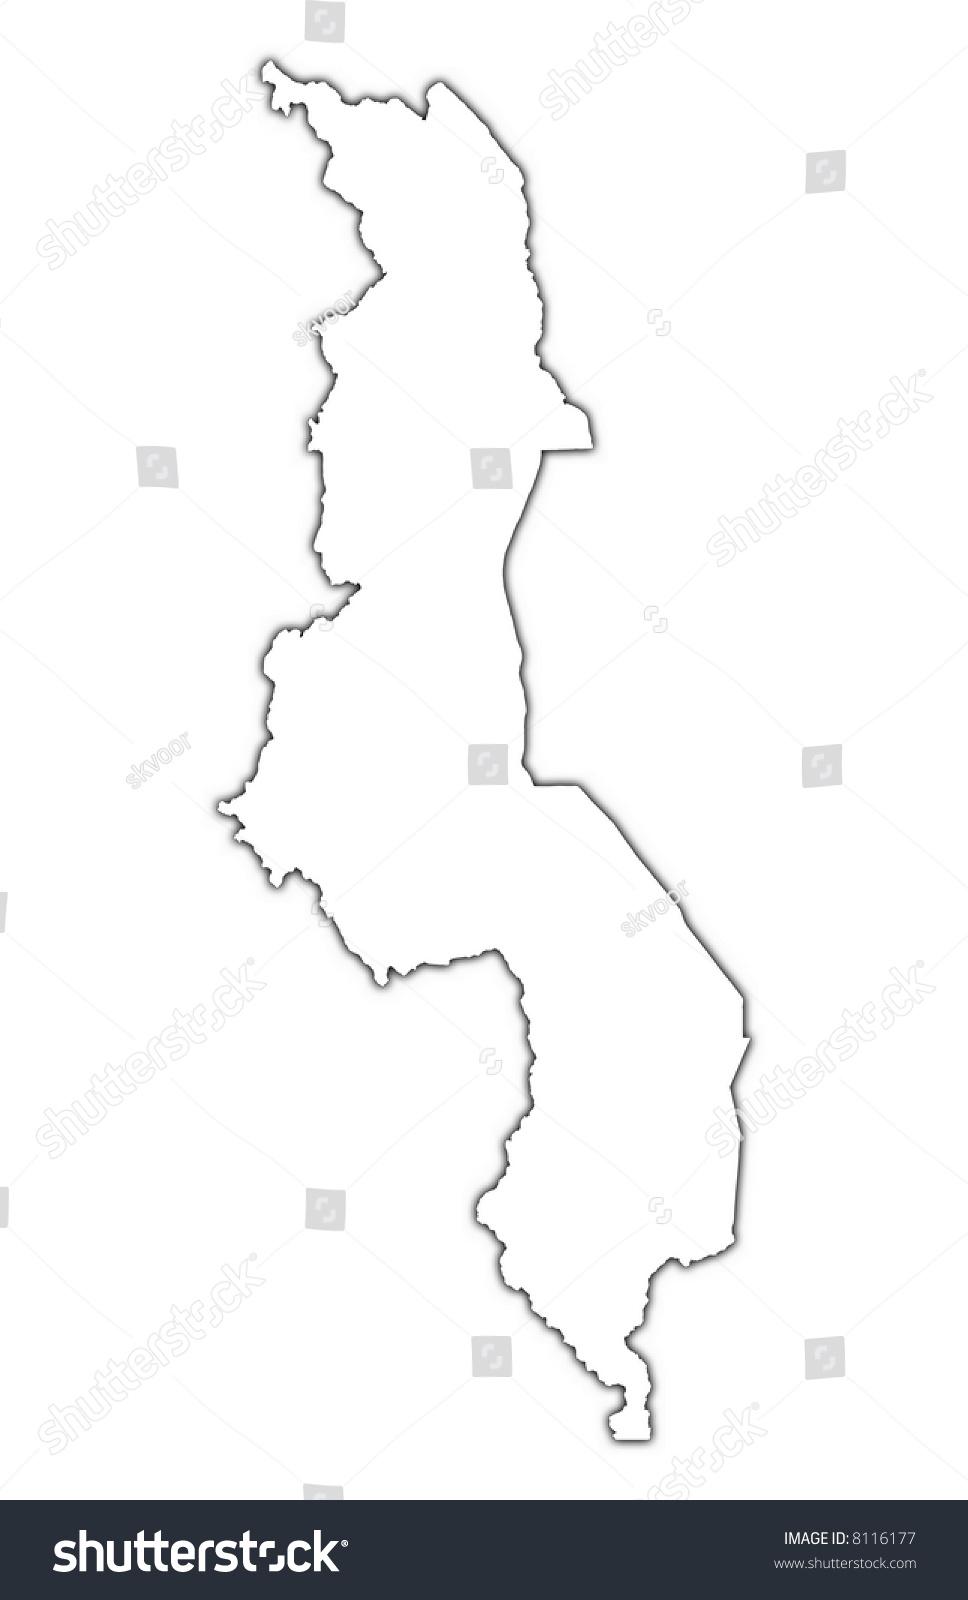 Malawi Outline Map Shadow Detailed Mercator Stock Illustration - Malawi blank map